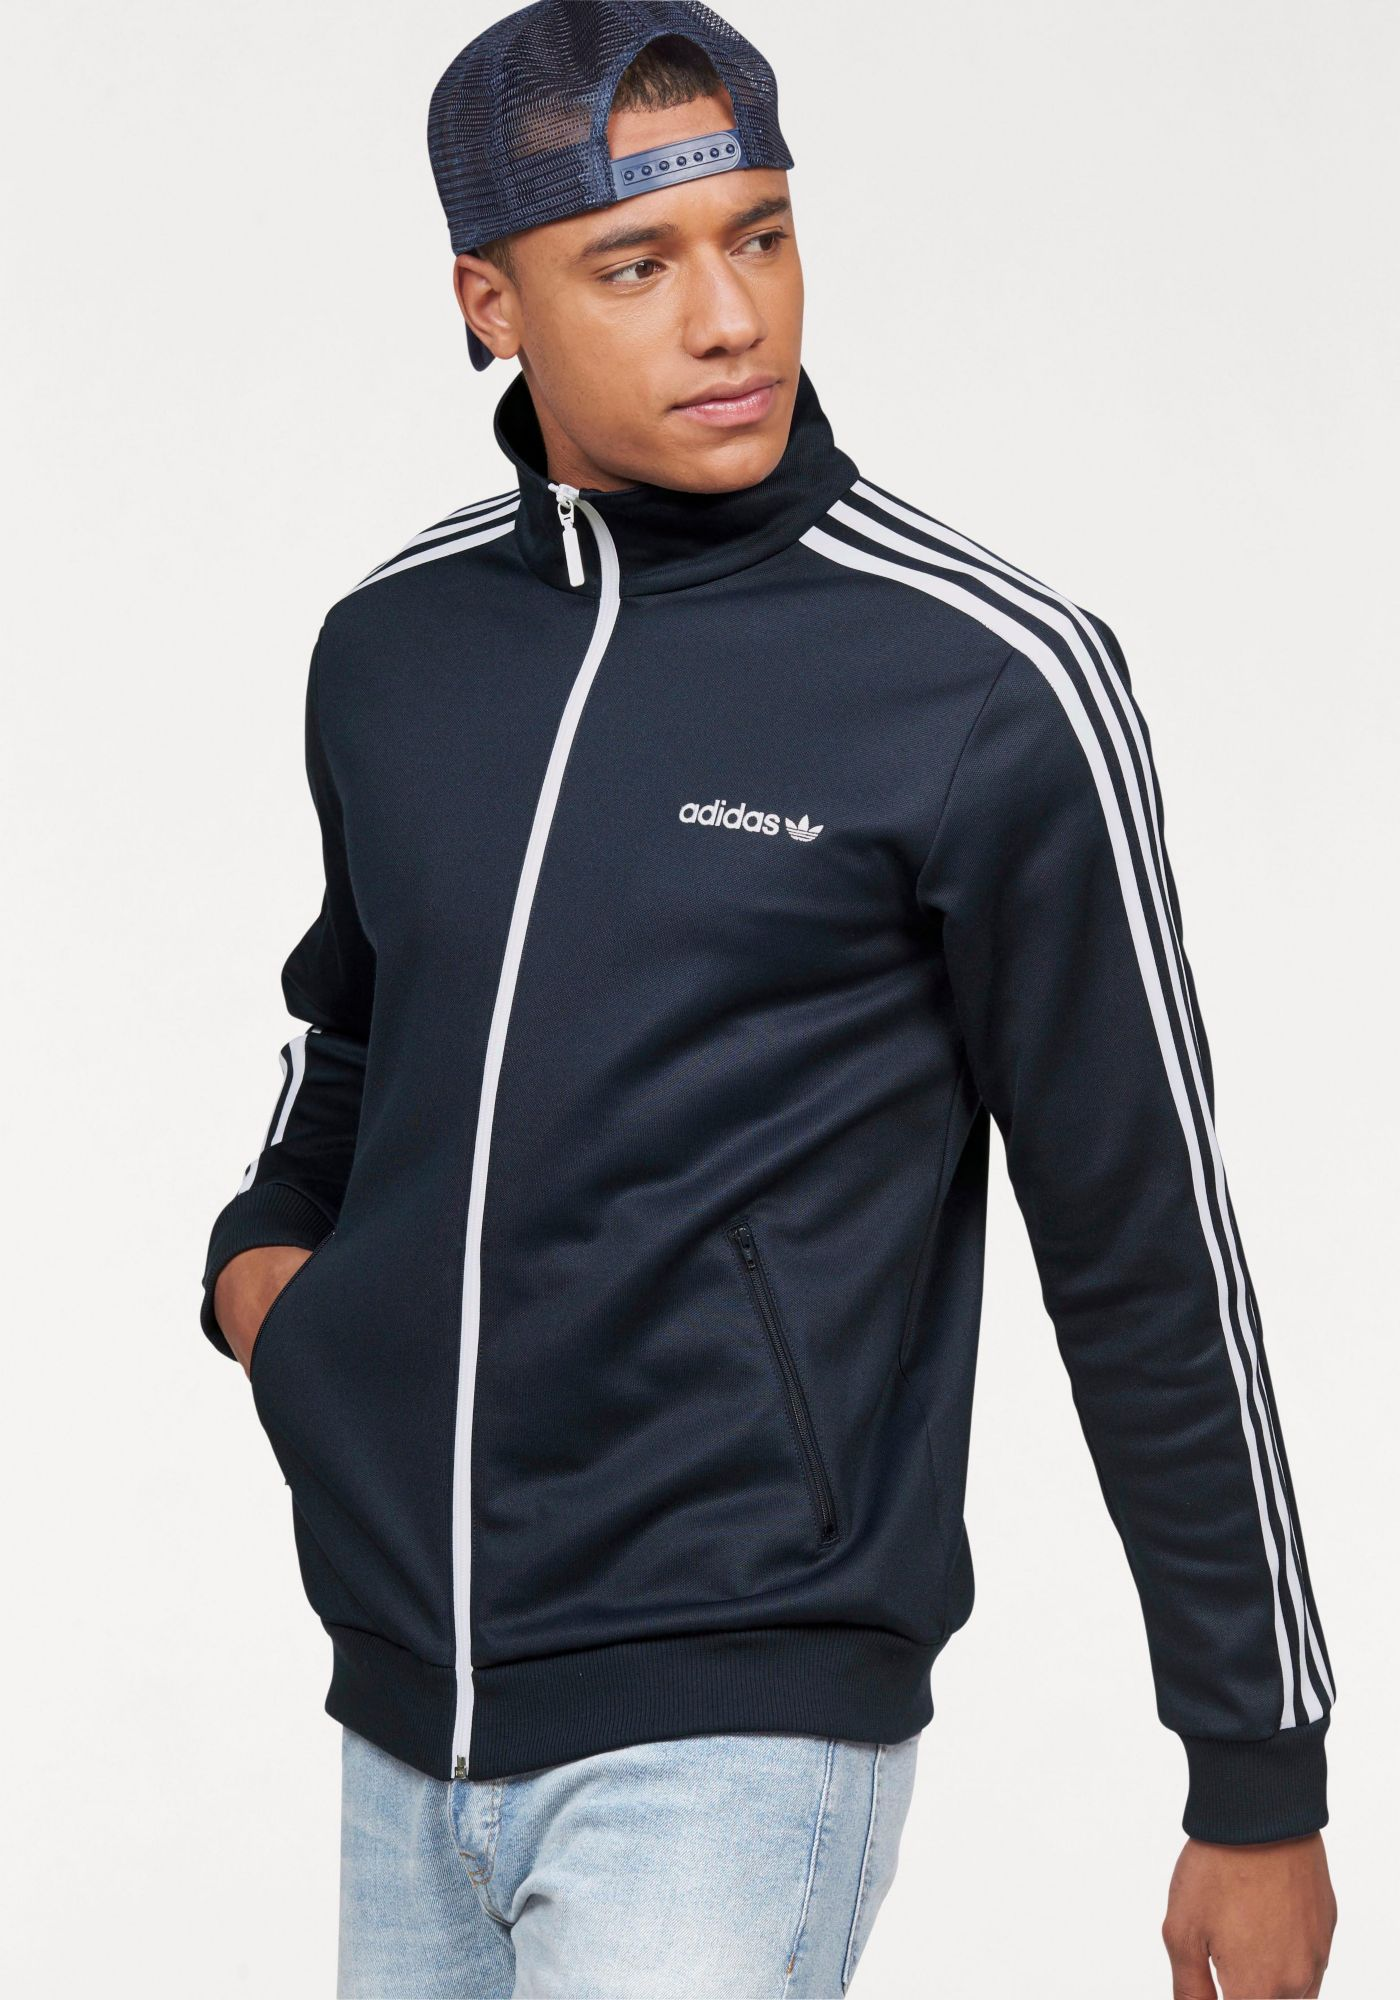 ADIDAS ORIGINALS adidas Originals Trainingsjacke »TRACK TOP«